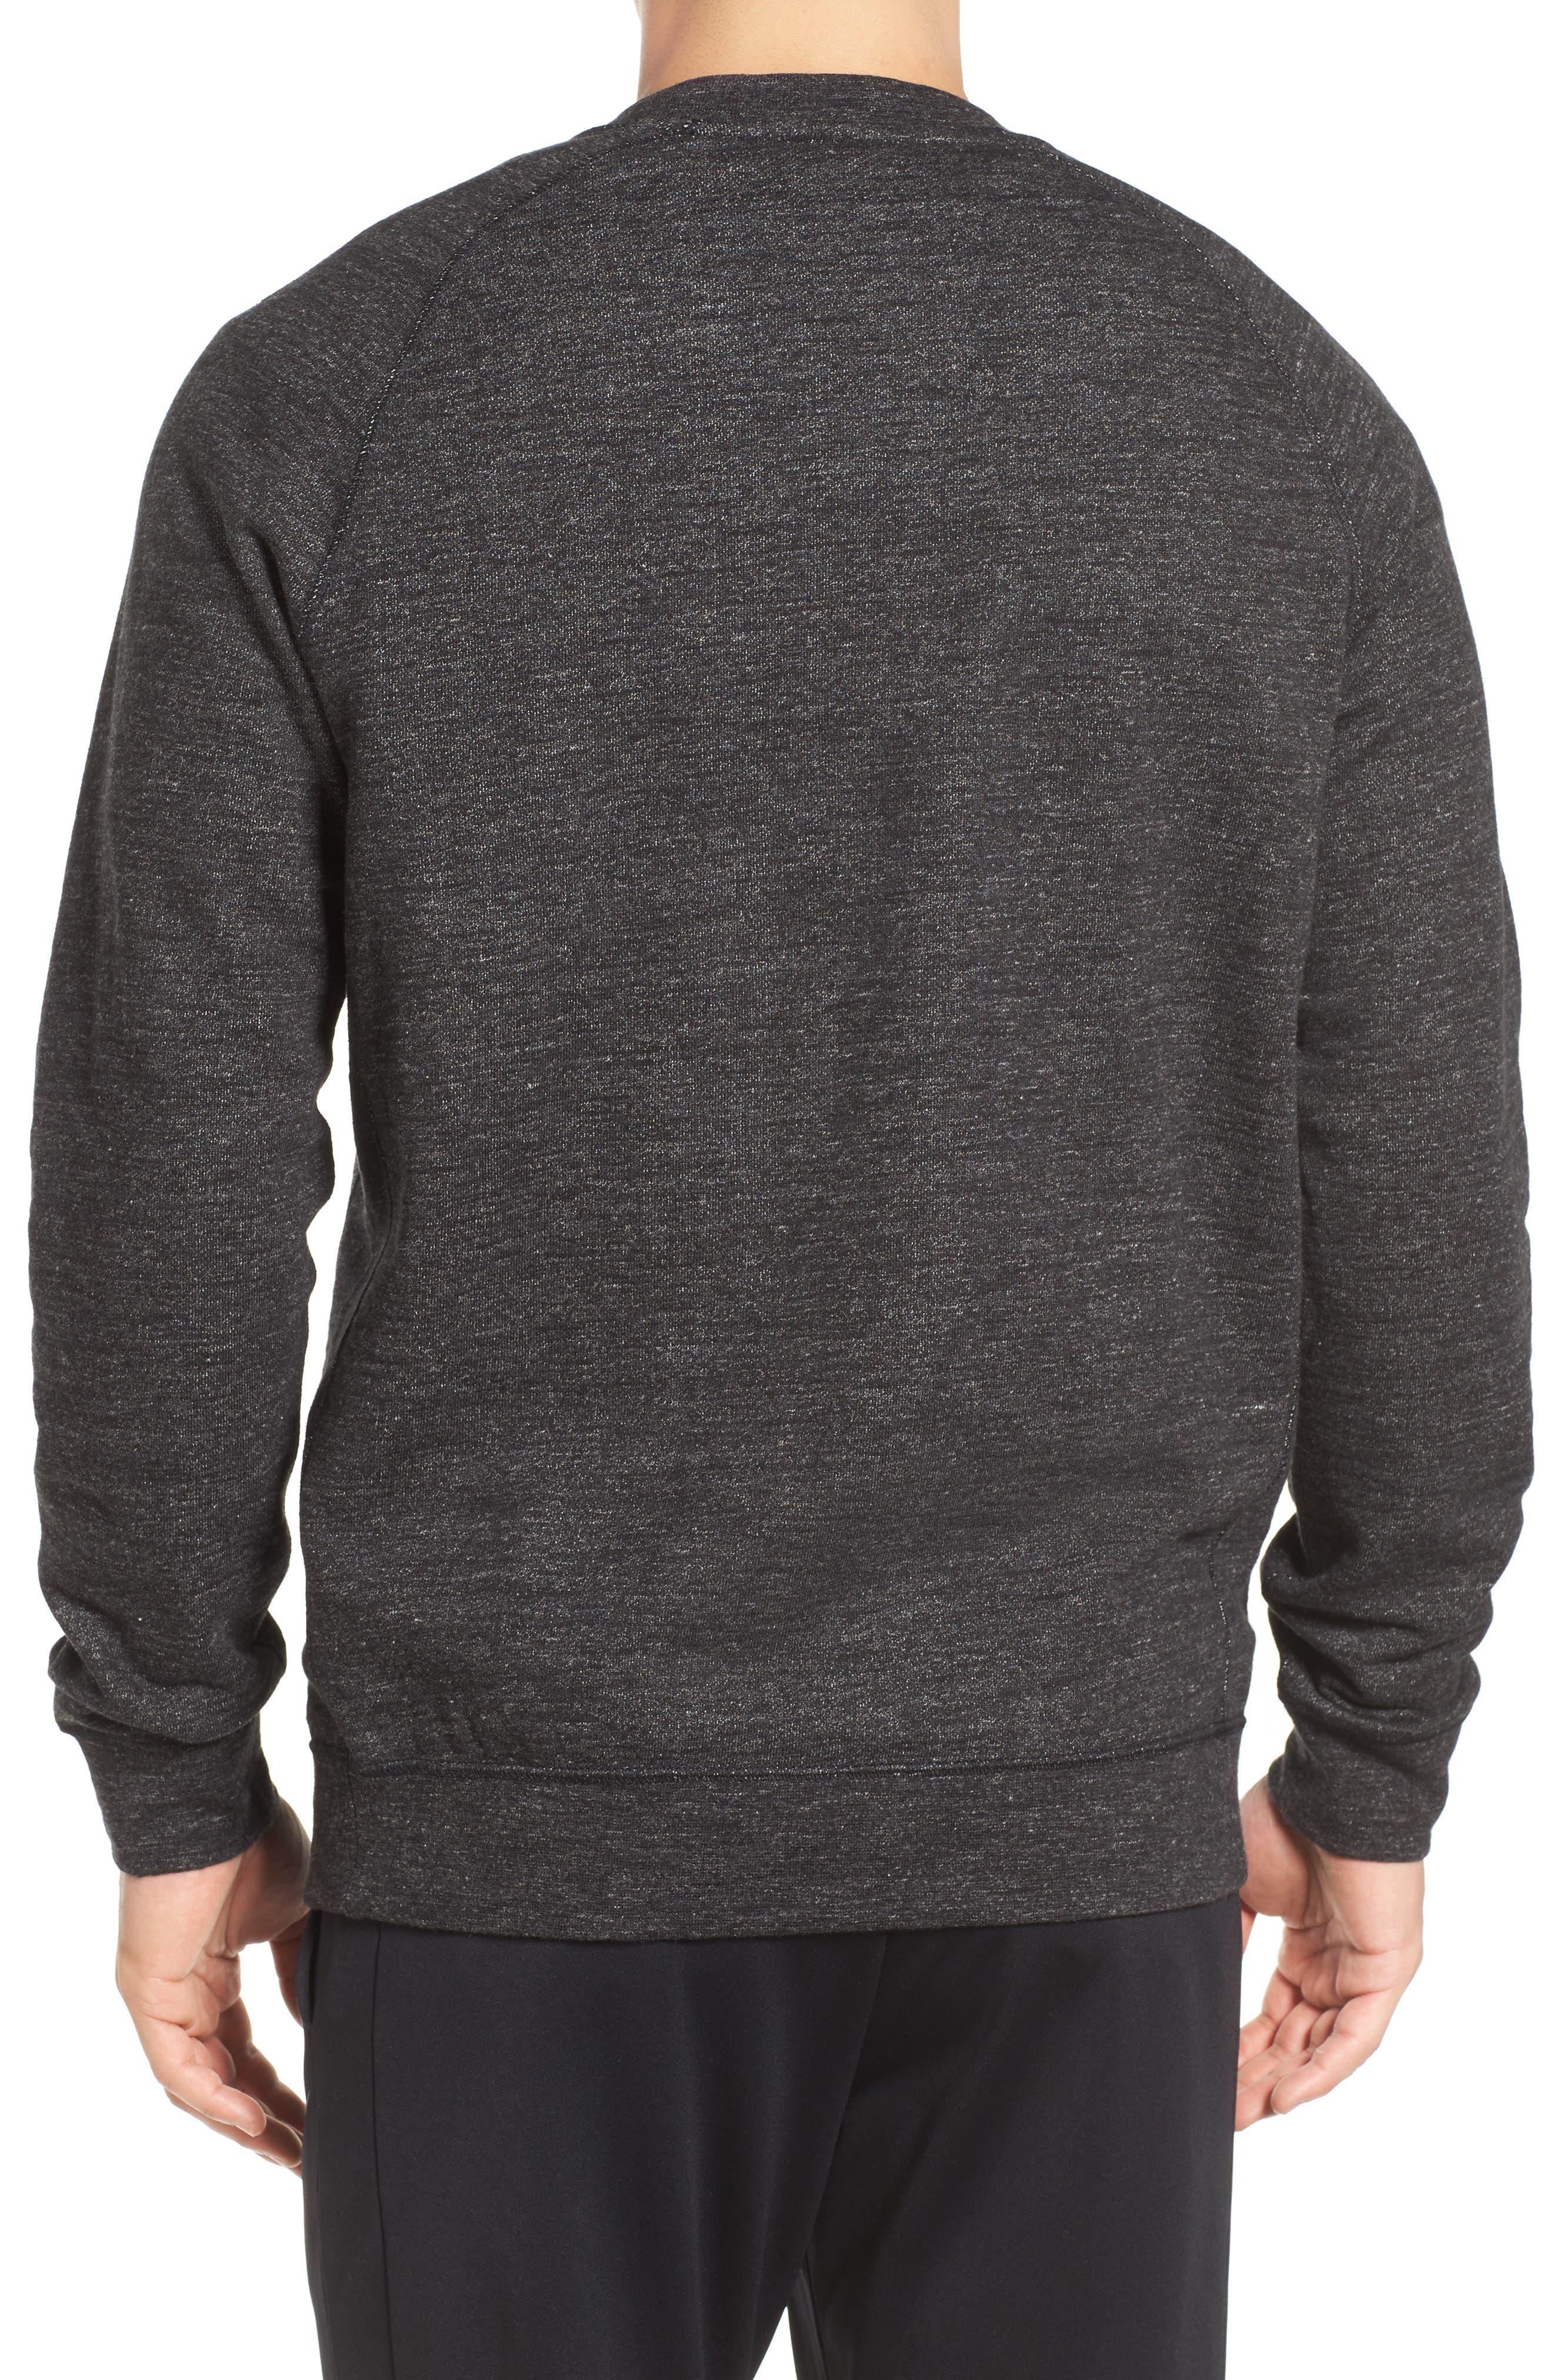 Legacy Raglan Crewneck Sweatshirt,                             Alternate thumbnail 4, color,